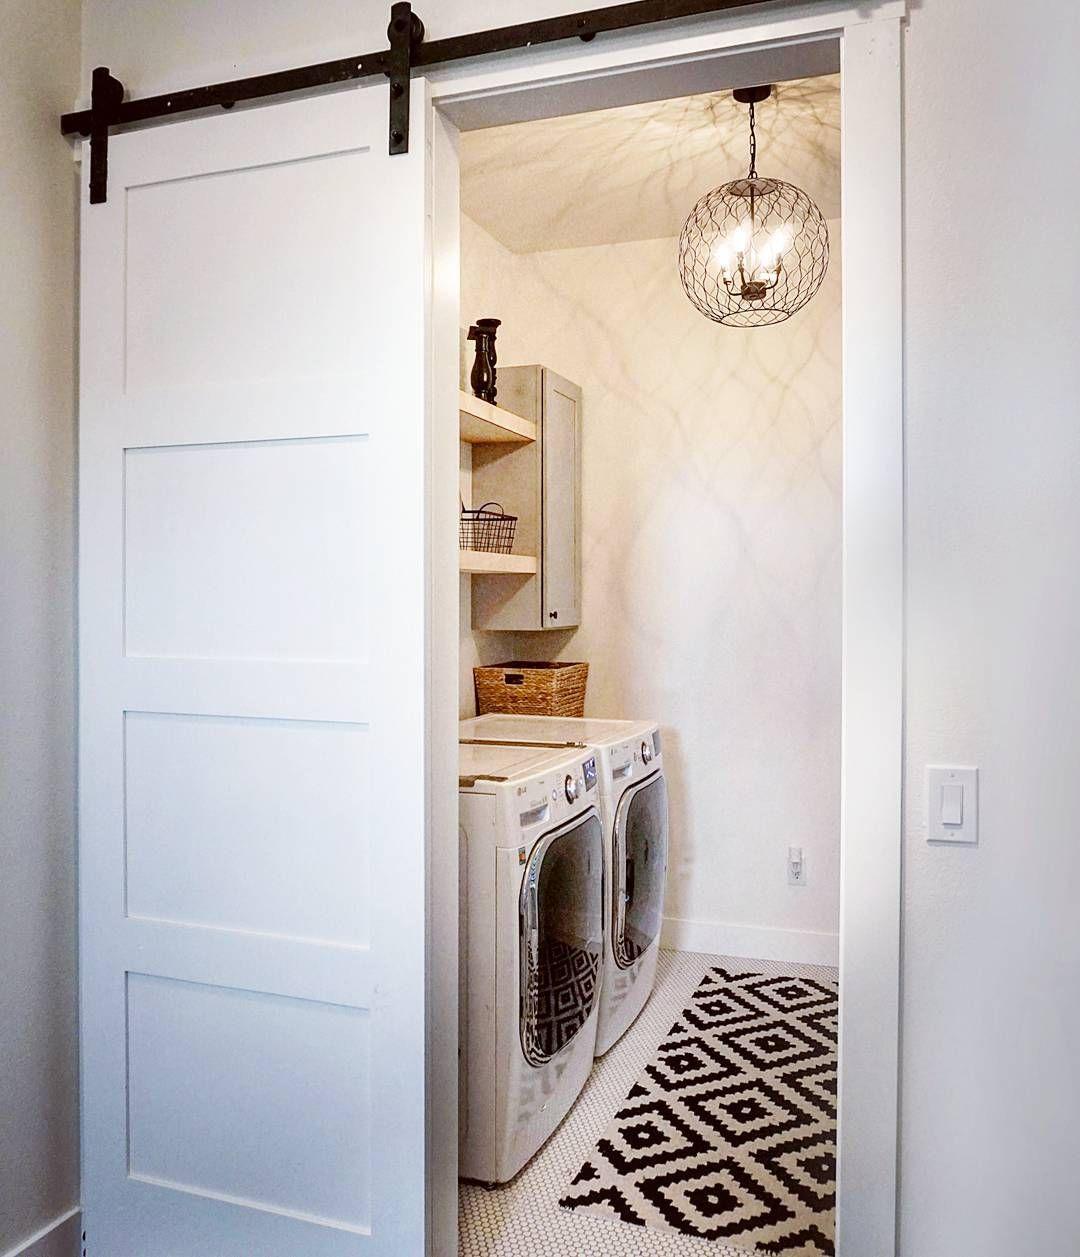 Cool 35 Inspiring Small Laundry Room Design Ideas https://homeylife ...